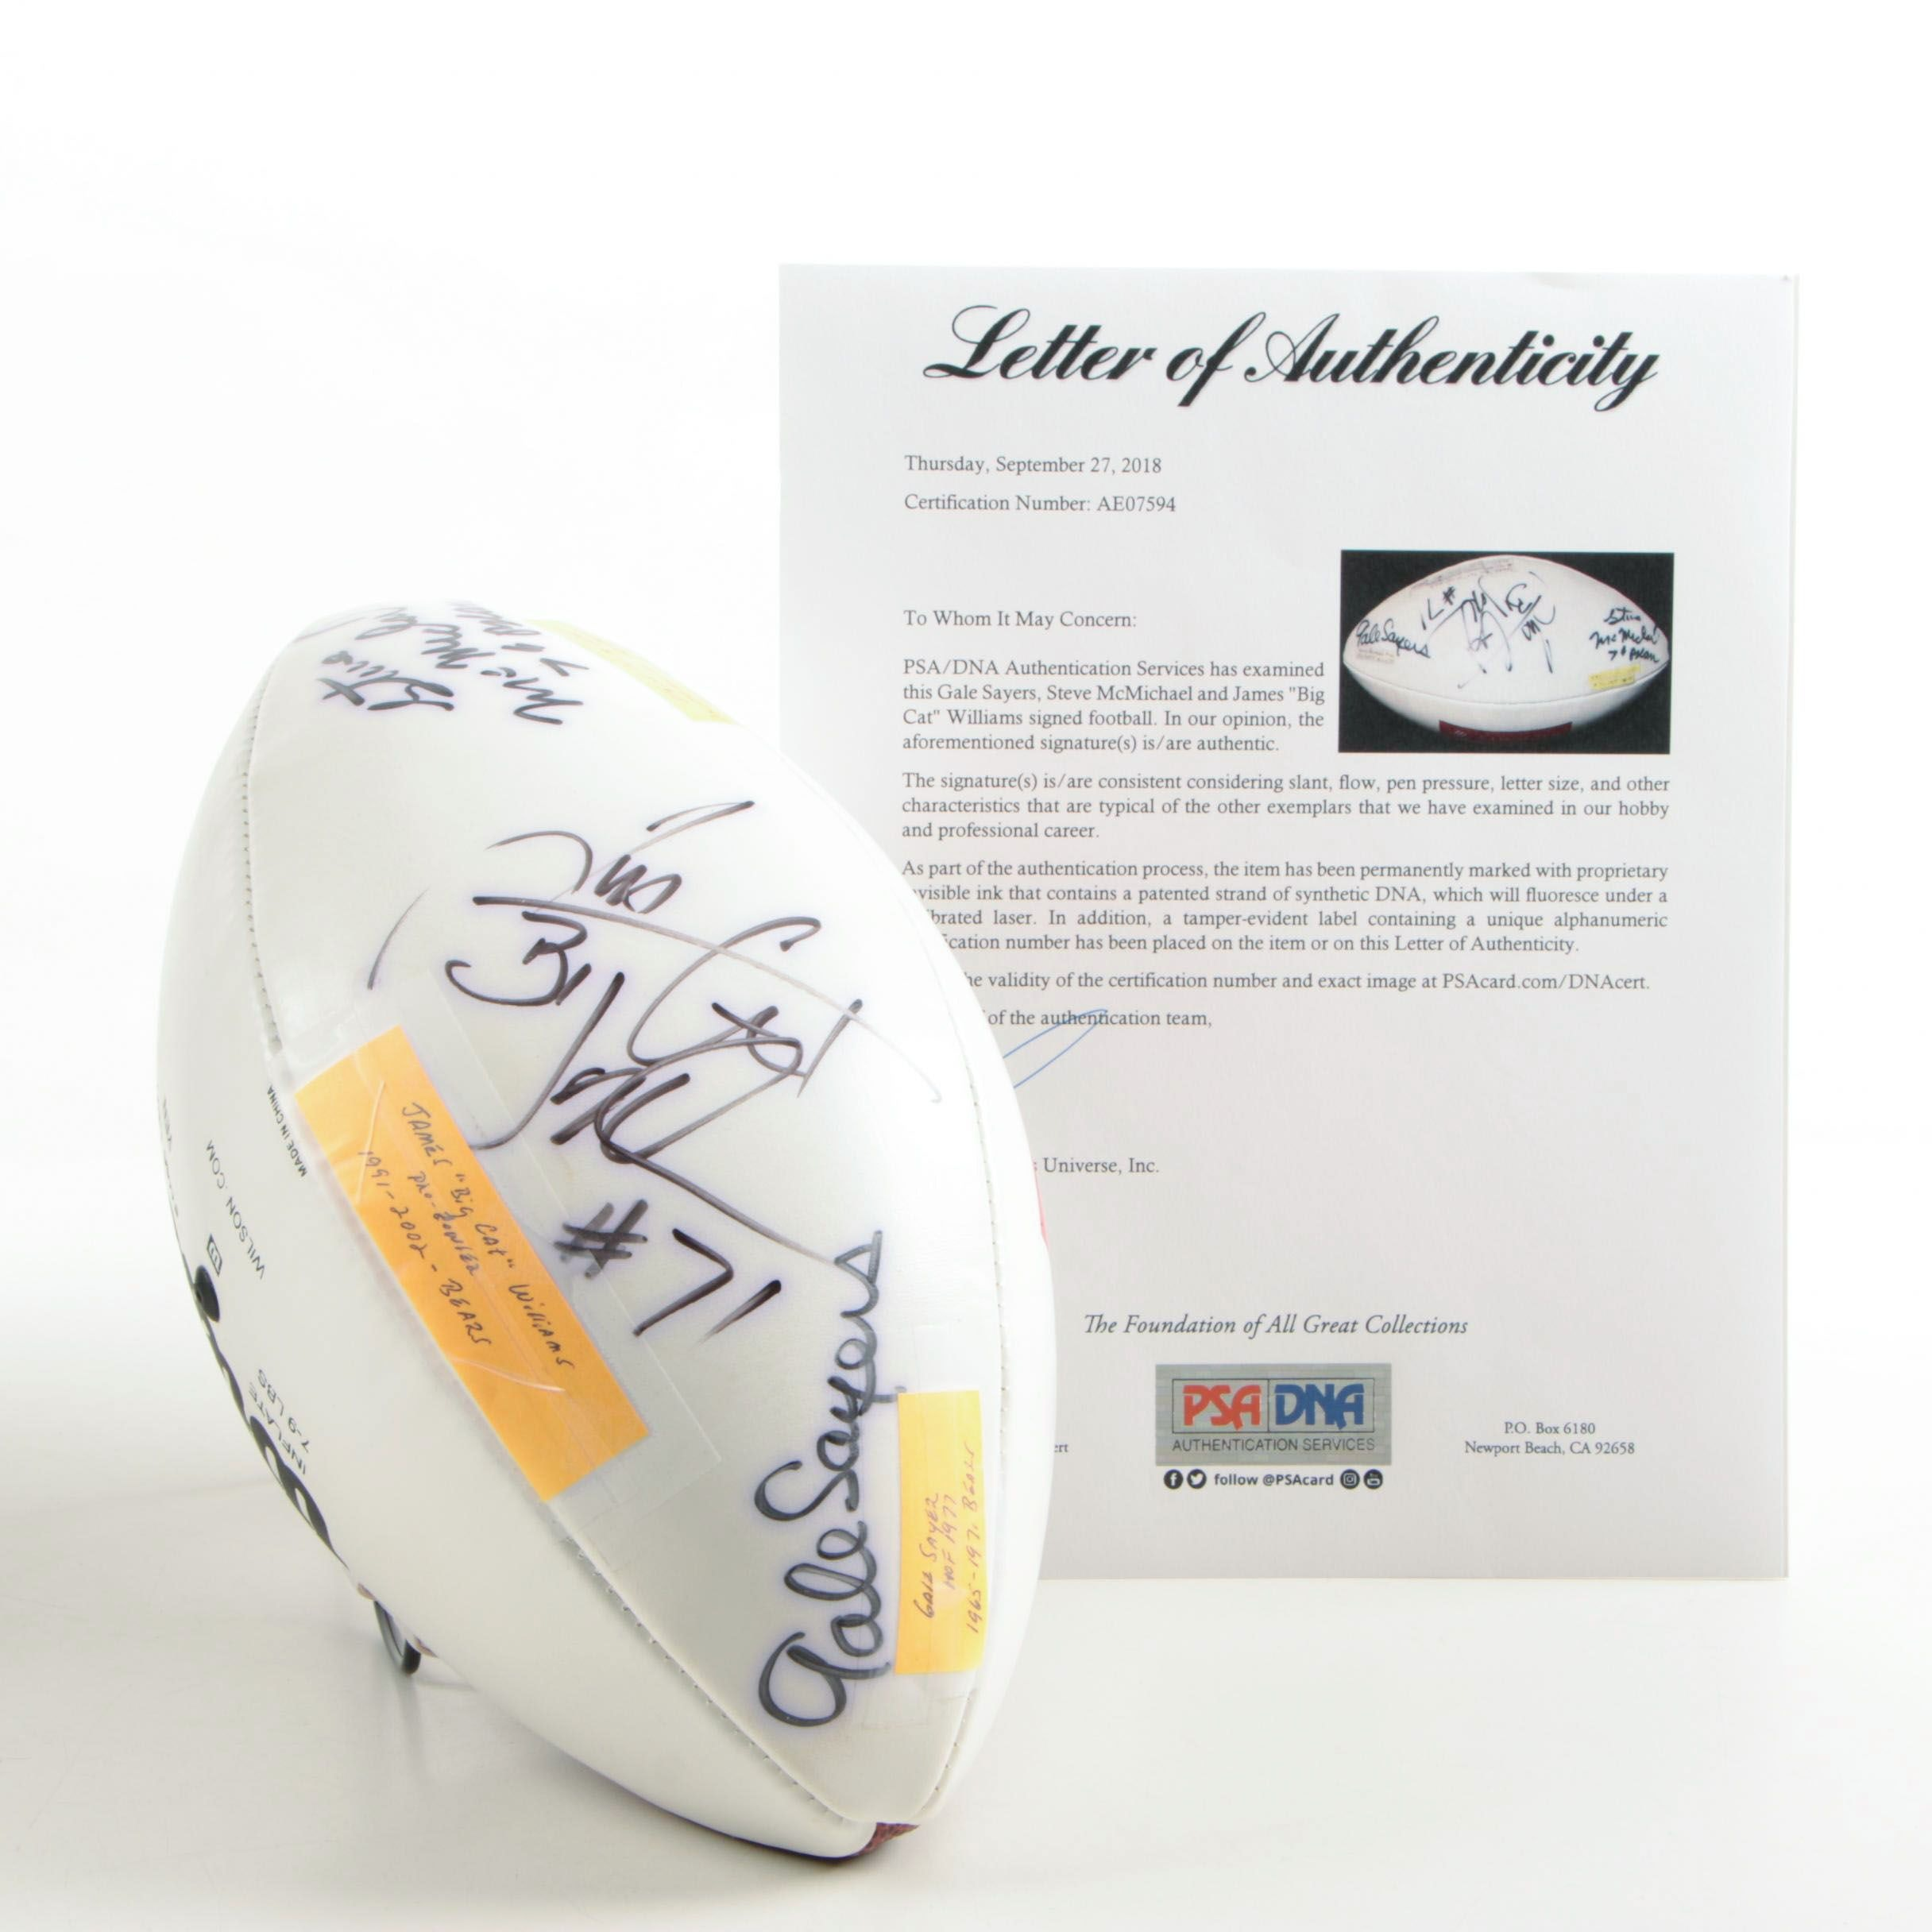 Gale Sayers, Steve McMichael, James William Autographed Football - PSA/DNA LOA